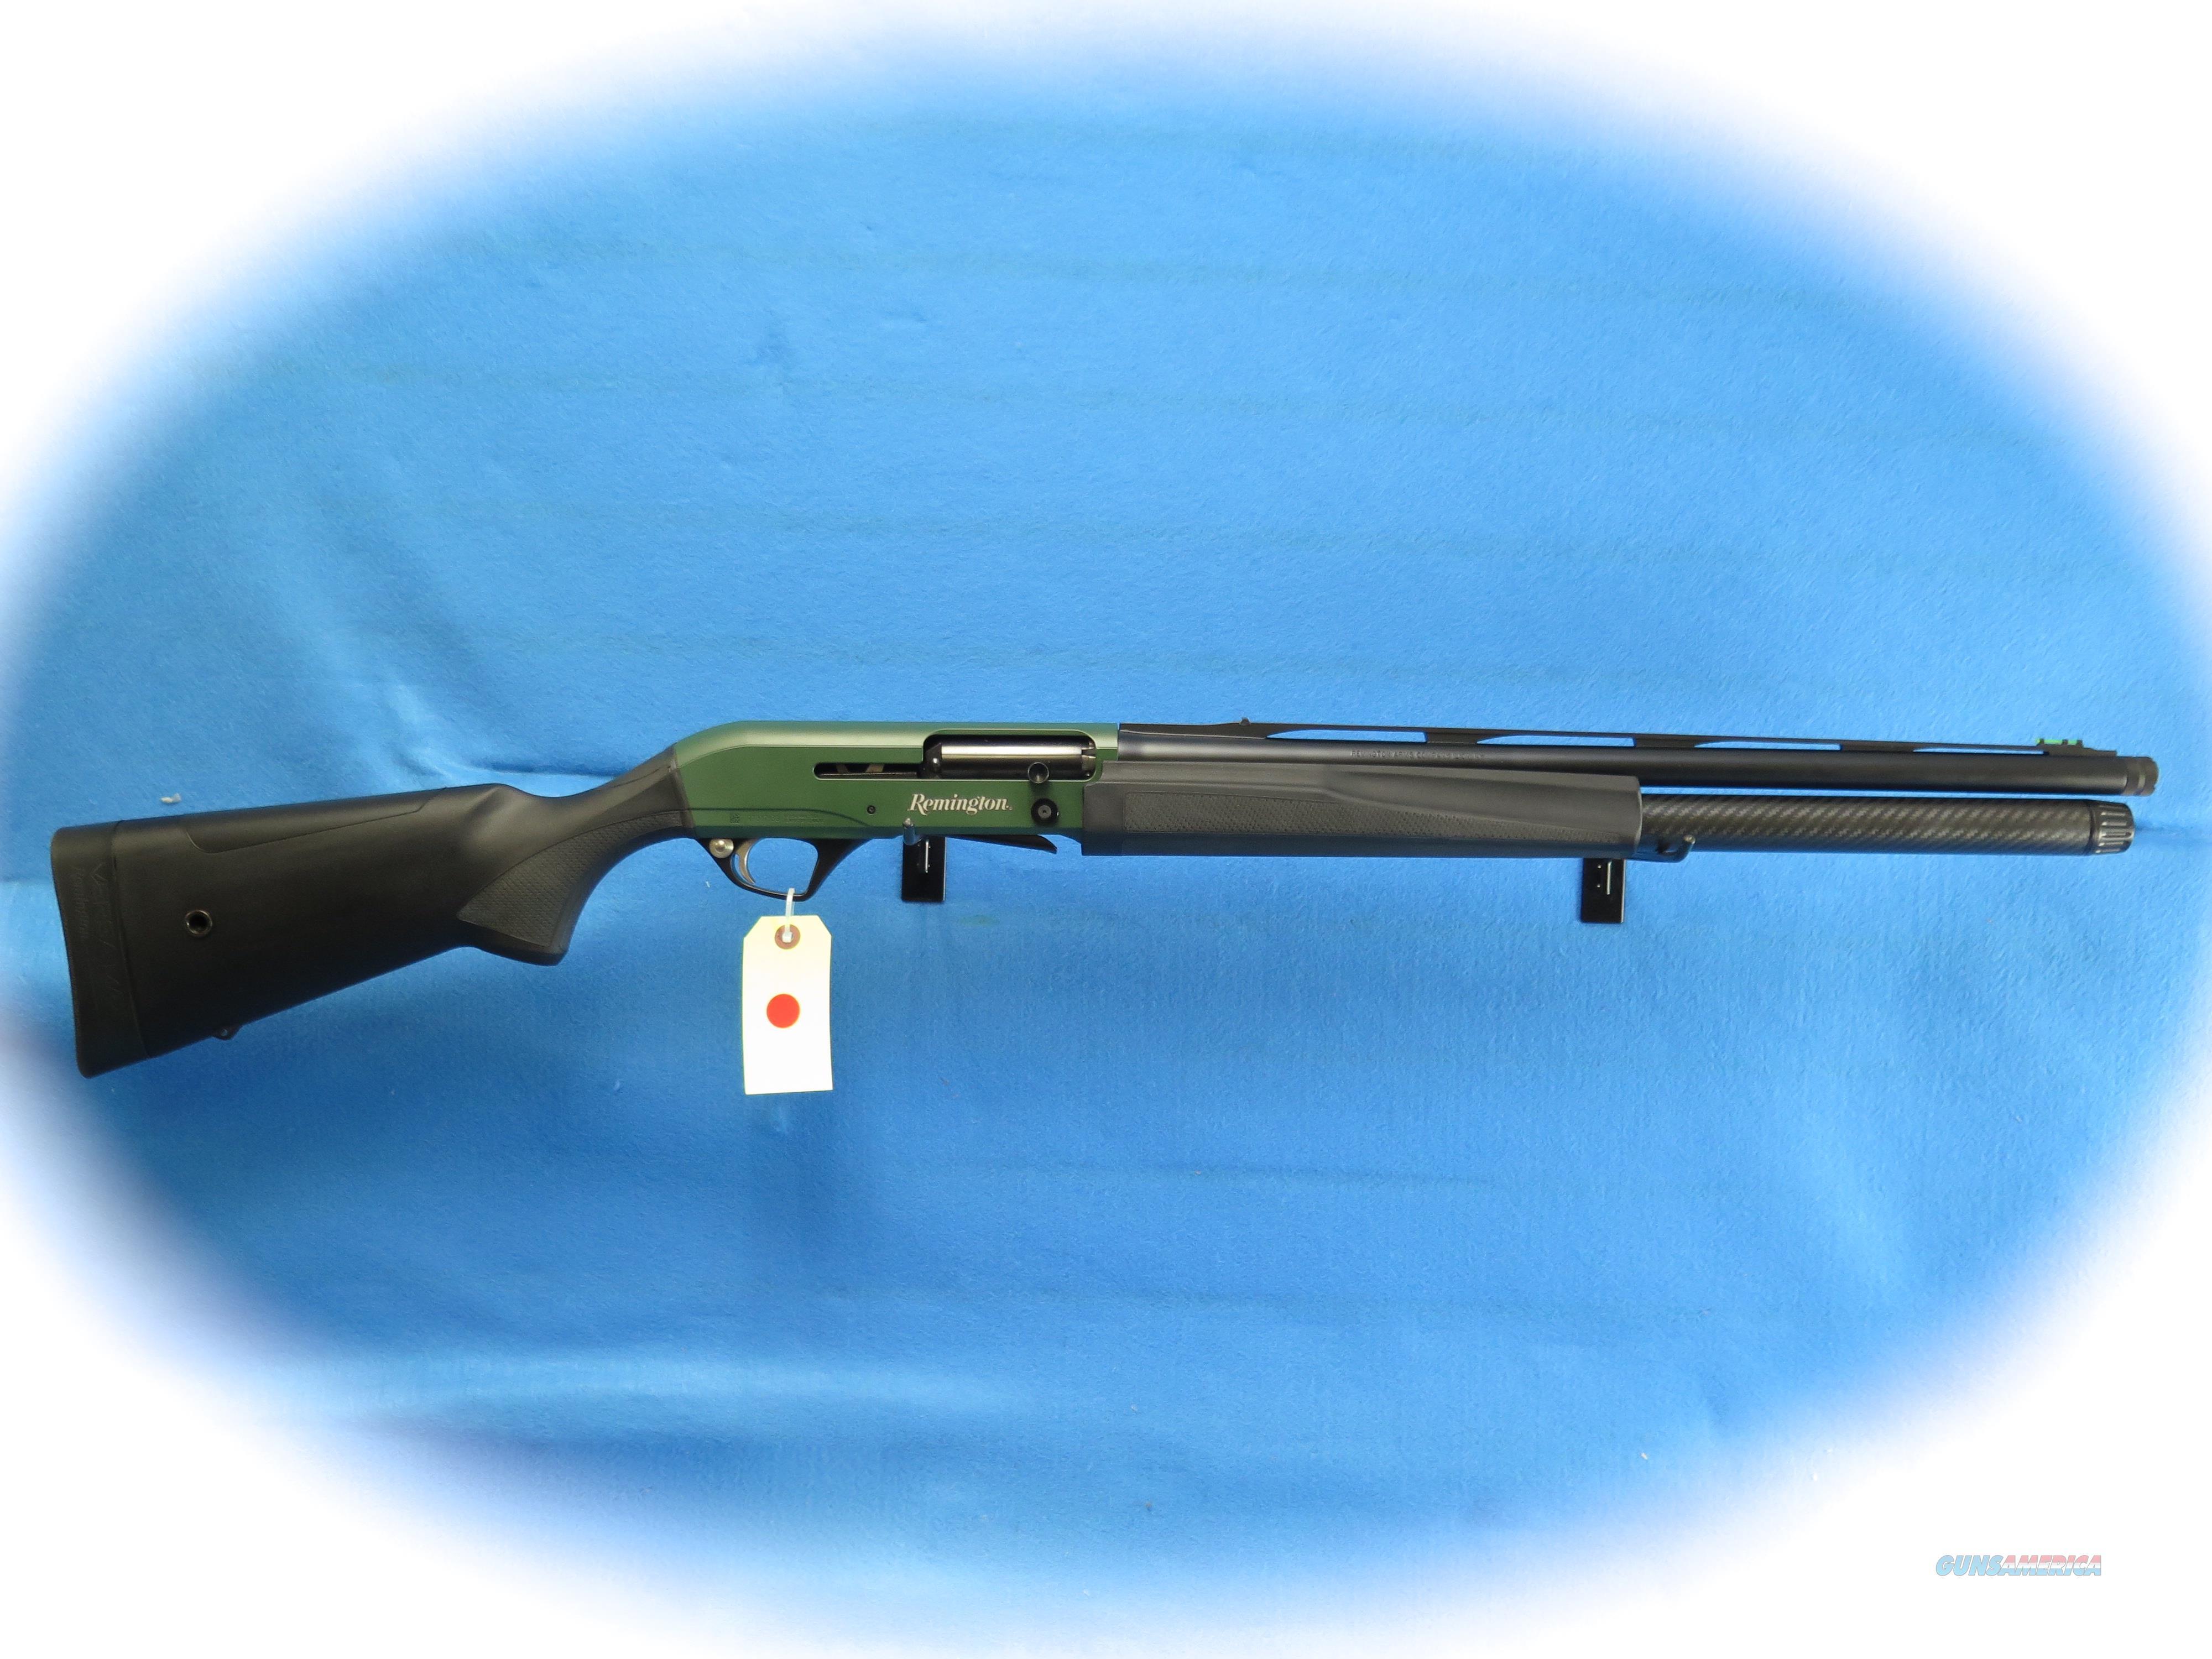 Remington Versa Max Competition Tactical 12 Ga. Semi Auto Shotgun **New**  Guns > Shotguns > Remington Shotguns  > Autoloaders > Tactical